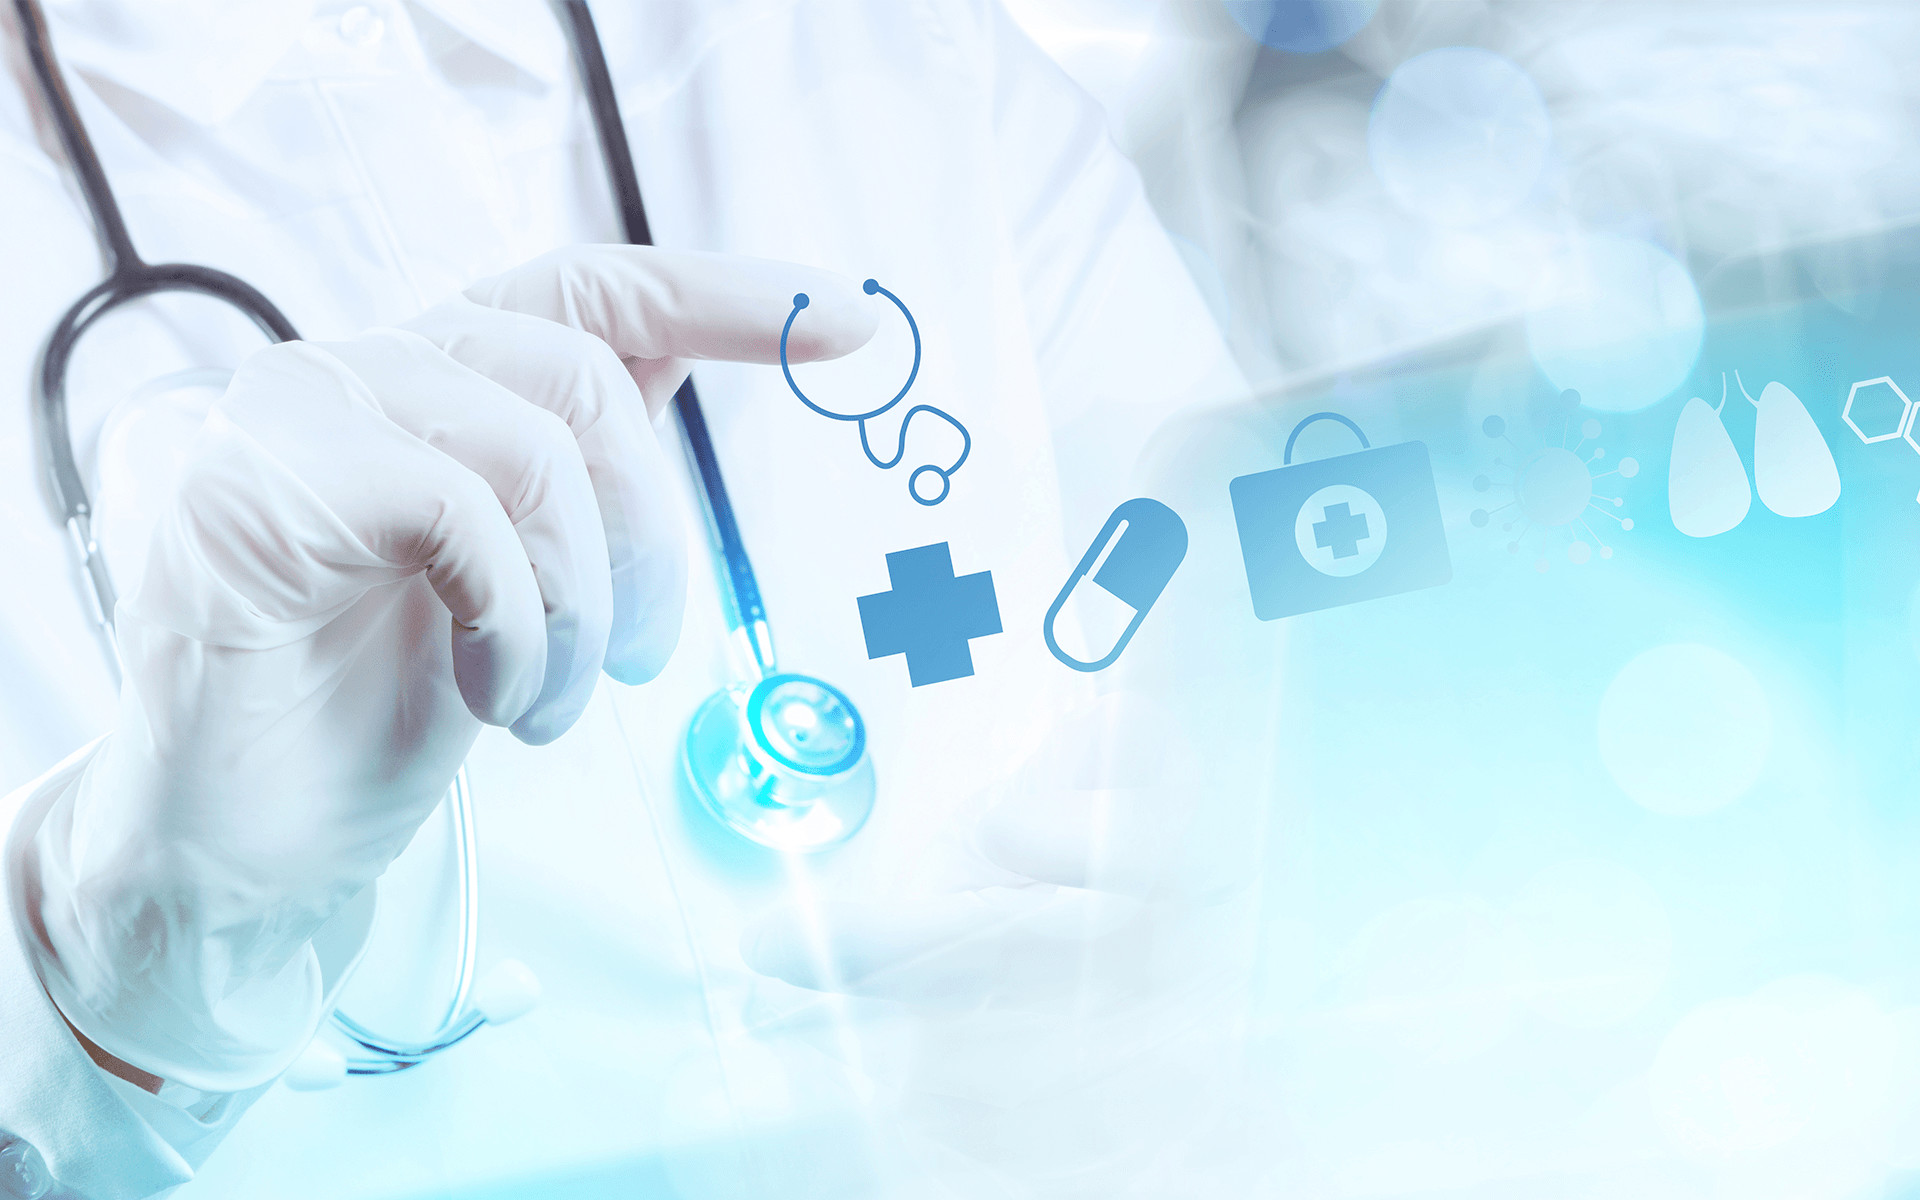 1514467-widescreen-medical-wallpaper-1920x1200-photo